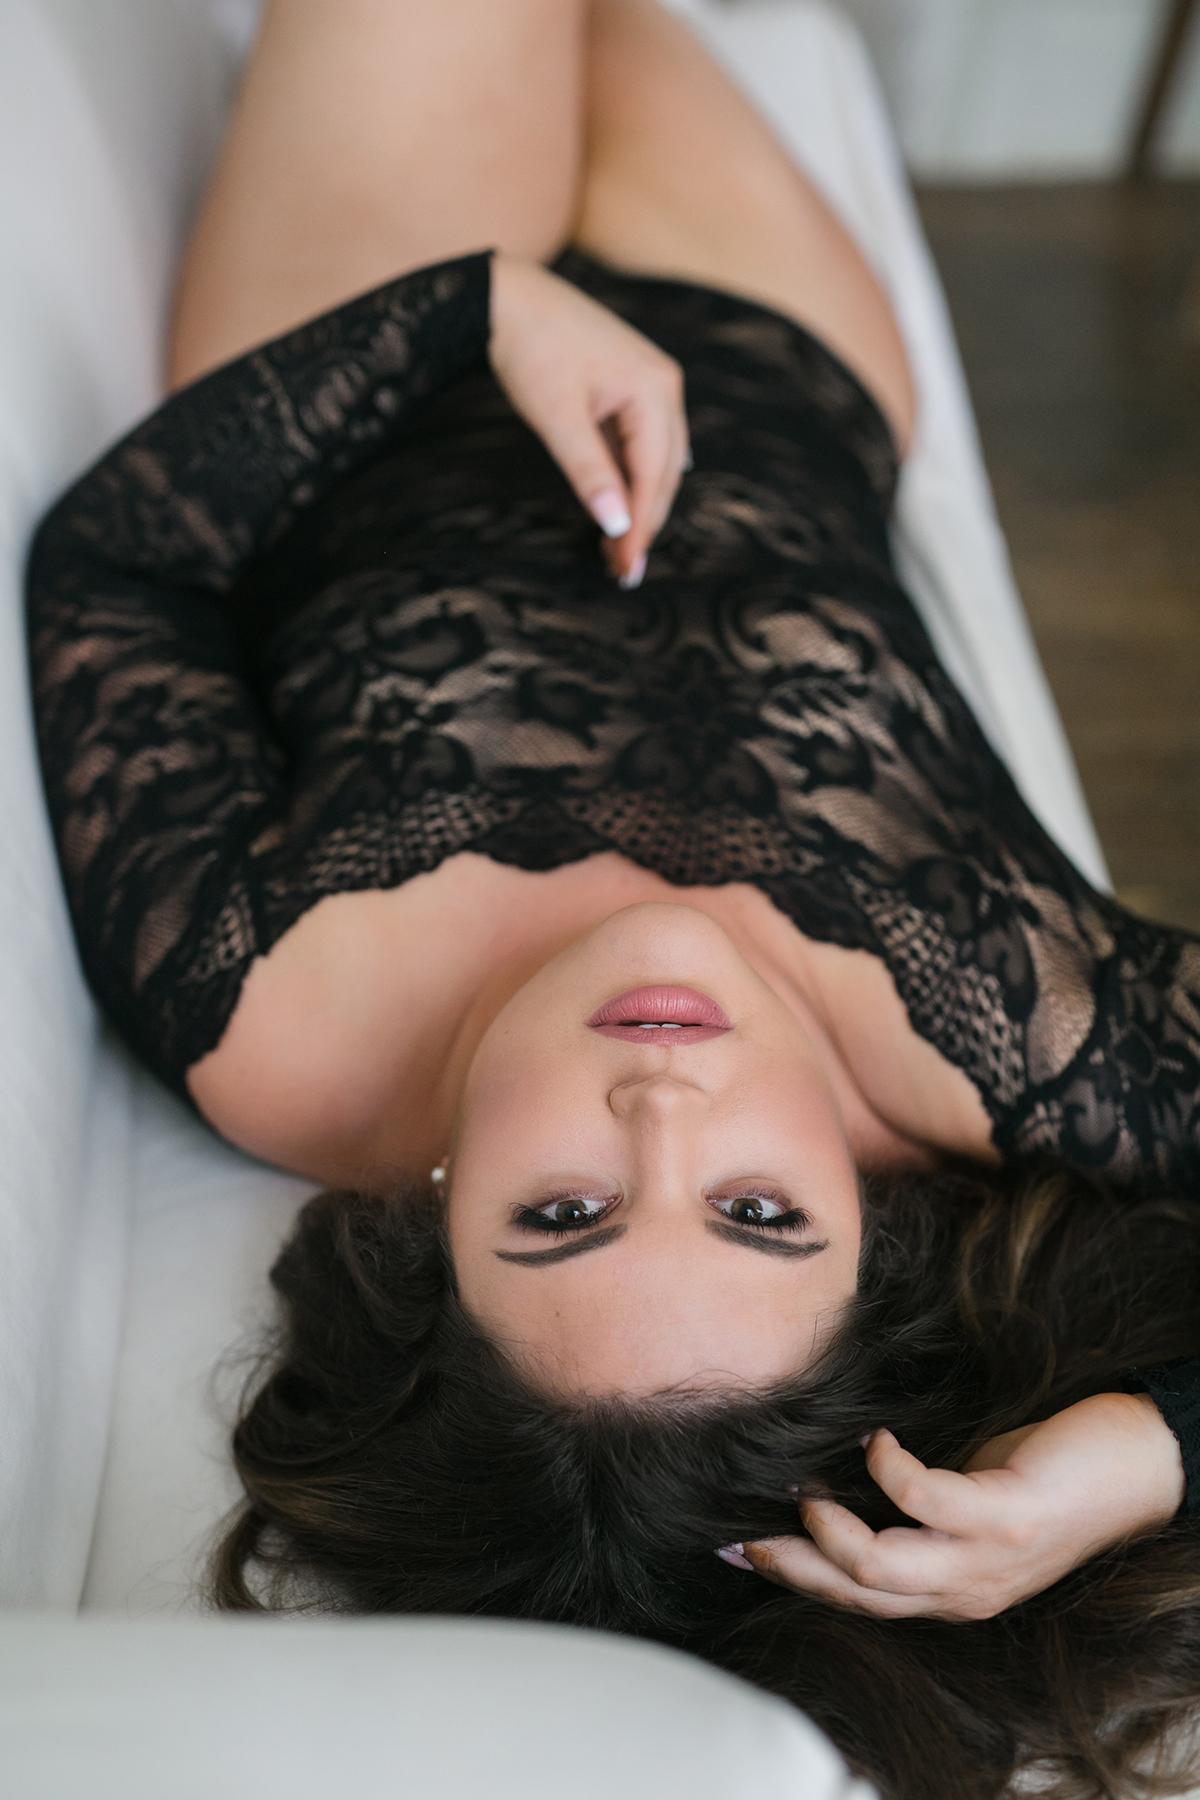 austin-tx-boudoir-photographer-photography-kimberly-brooke-12.jpg